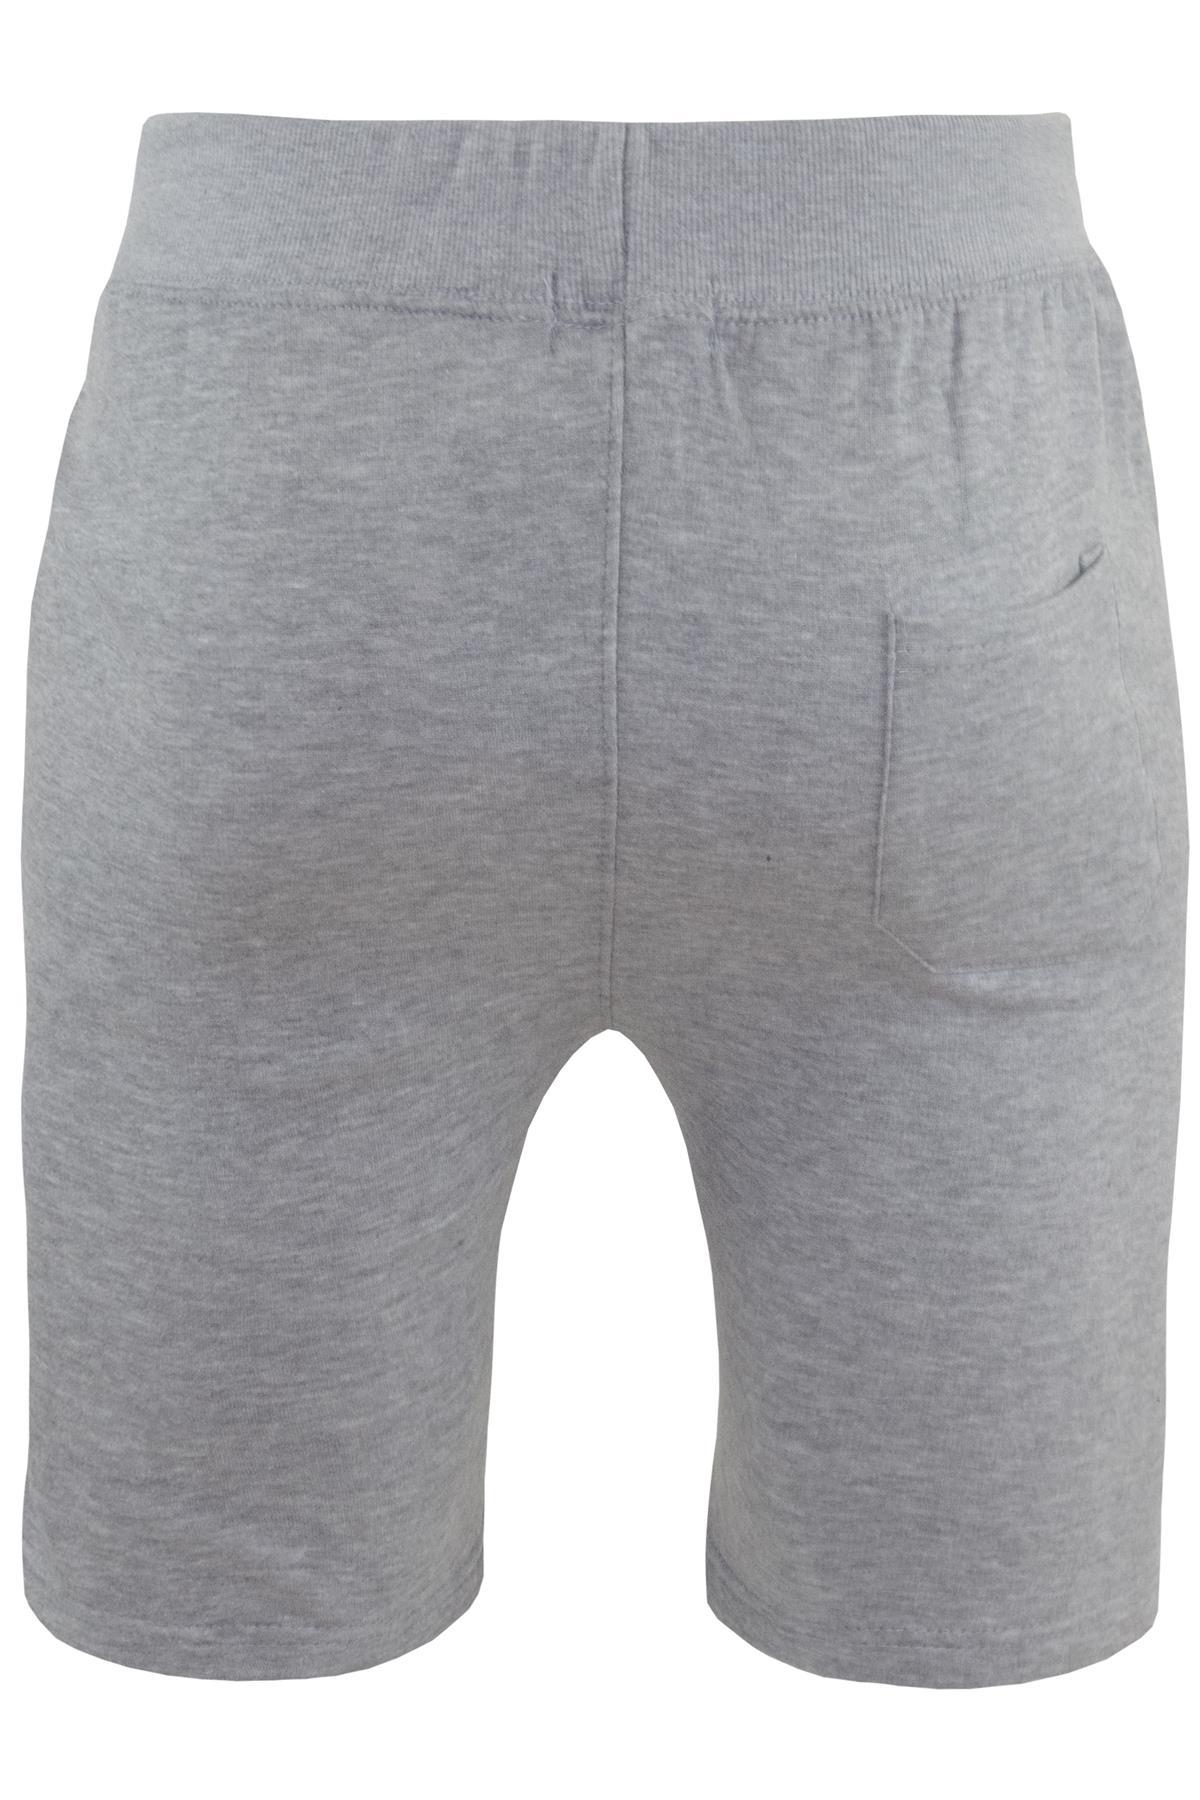 Mens-Contrast-Panel-Running-Summer-Side-Slit-Knee-Length-Fleece-Bottoms-Shorts thumbnail 50